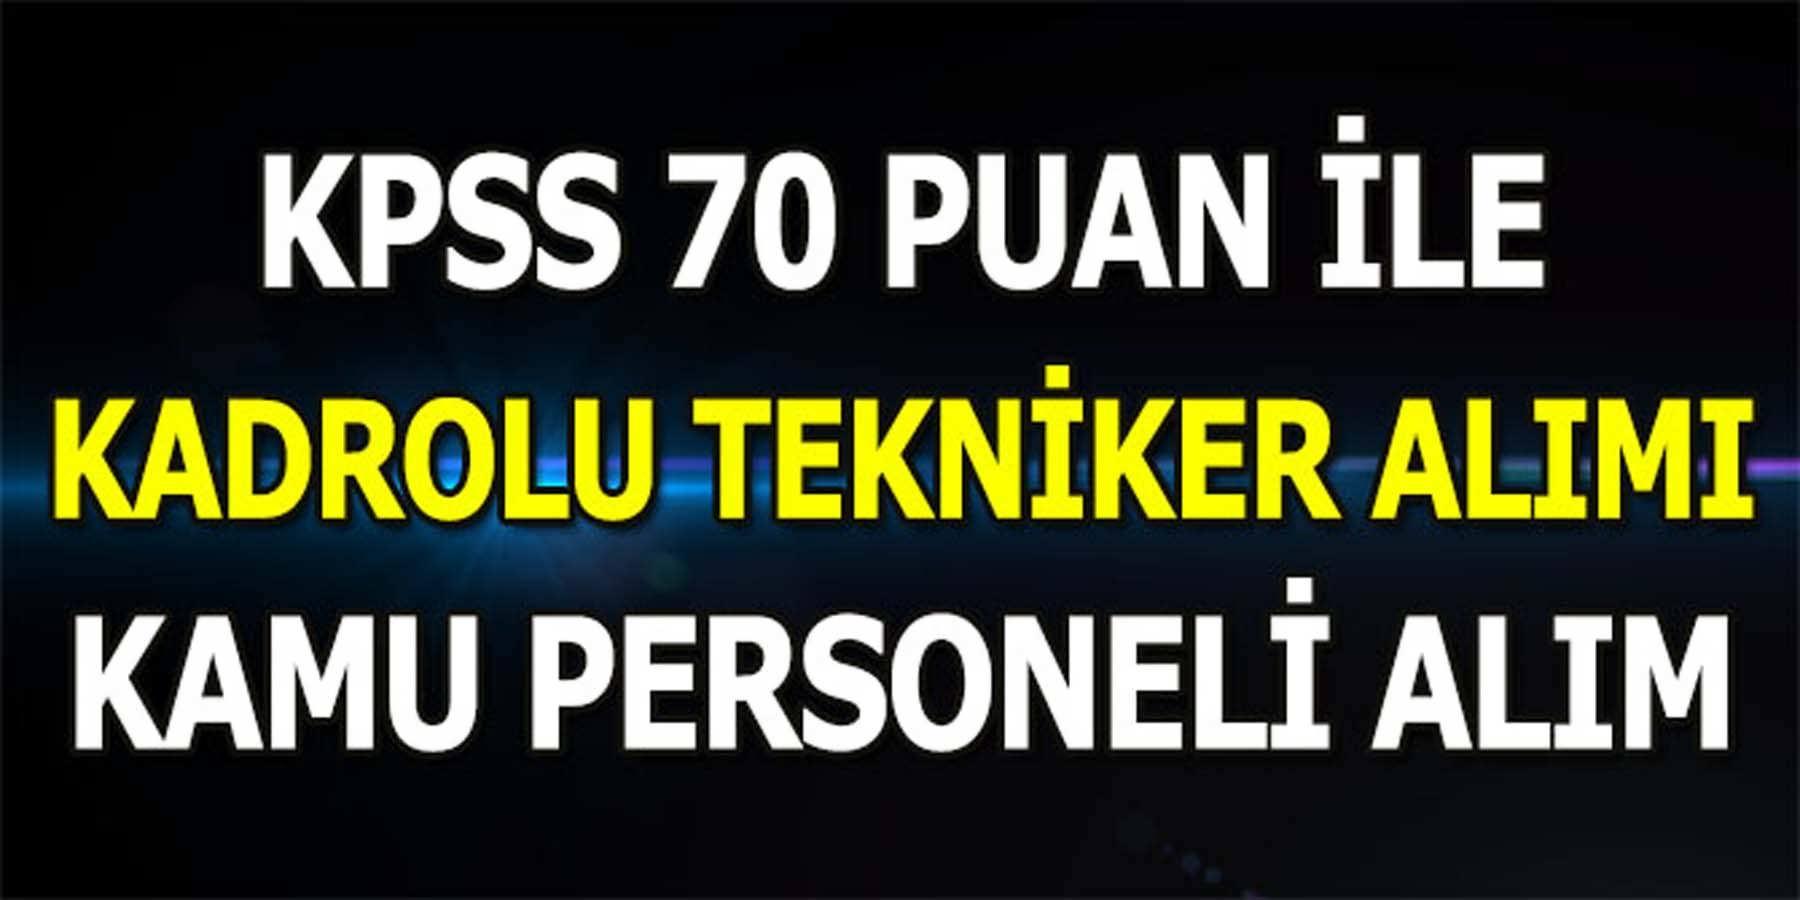 KPSS 70 Puan İle Kadrolu Kamu Personeli Alımı (TEKNİKER)